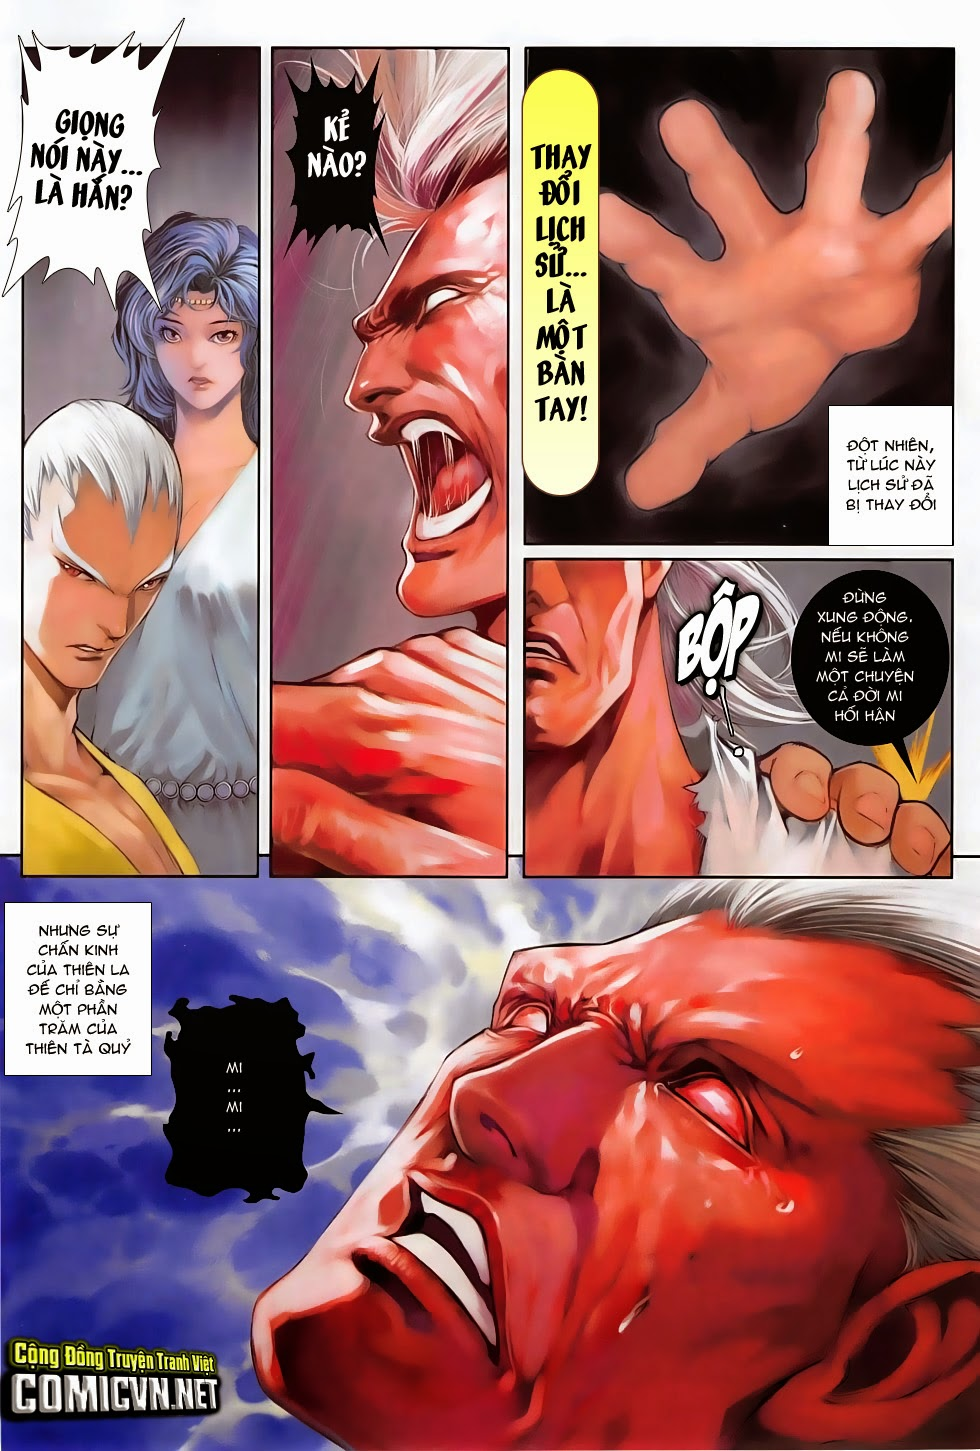 Ba Động Quyền Z Hadouken Zero chap 15 - Trang 7